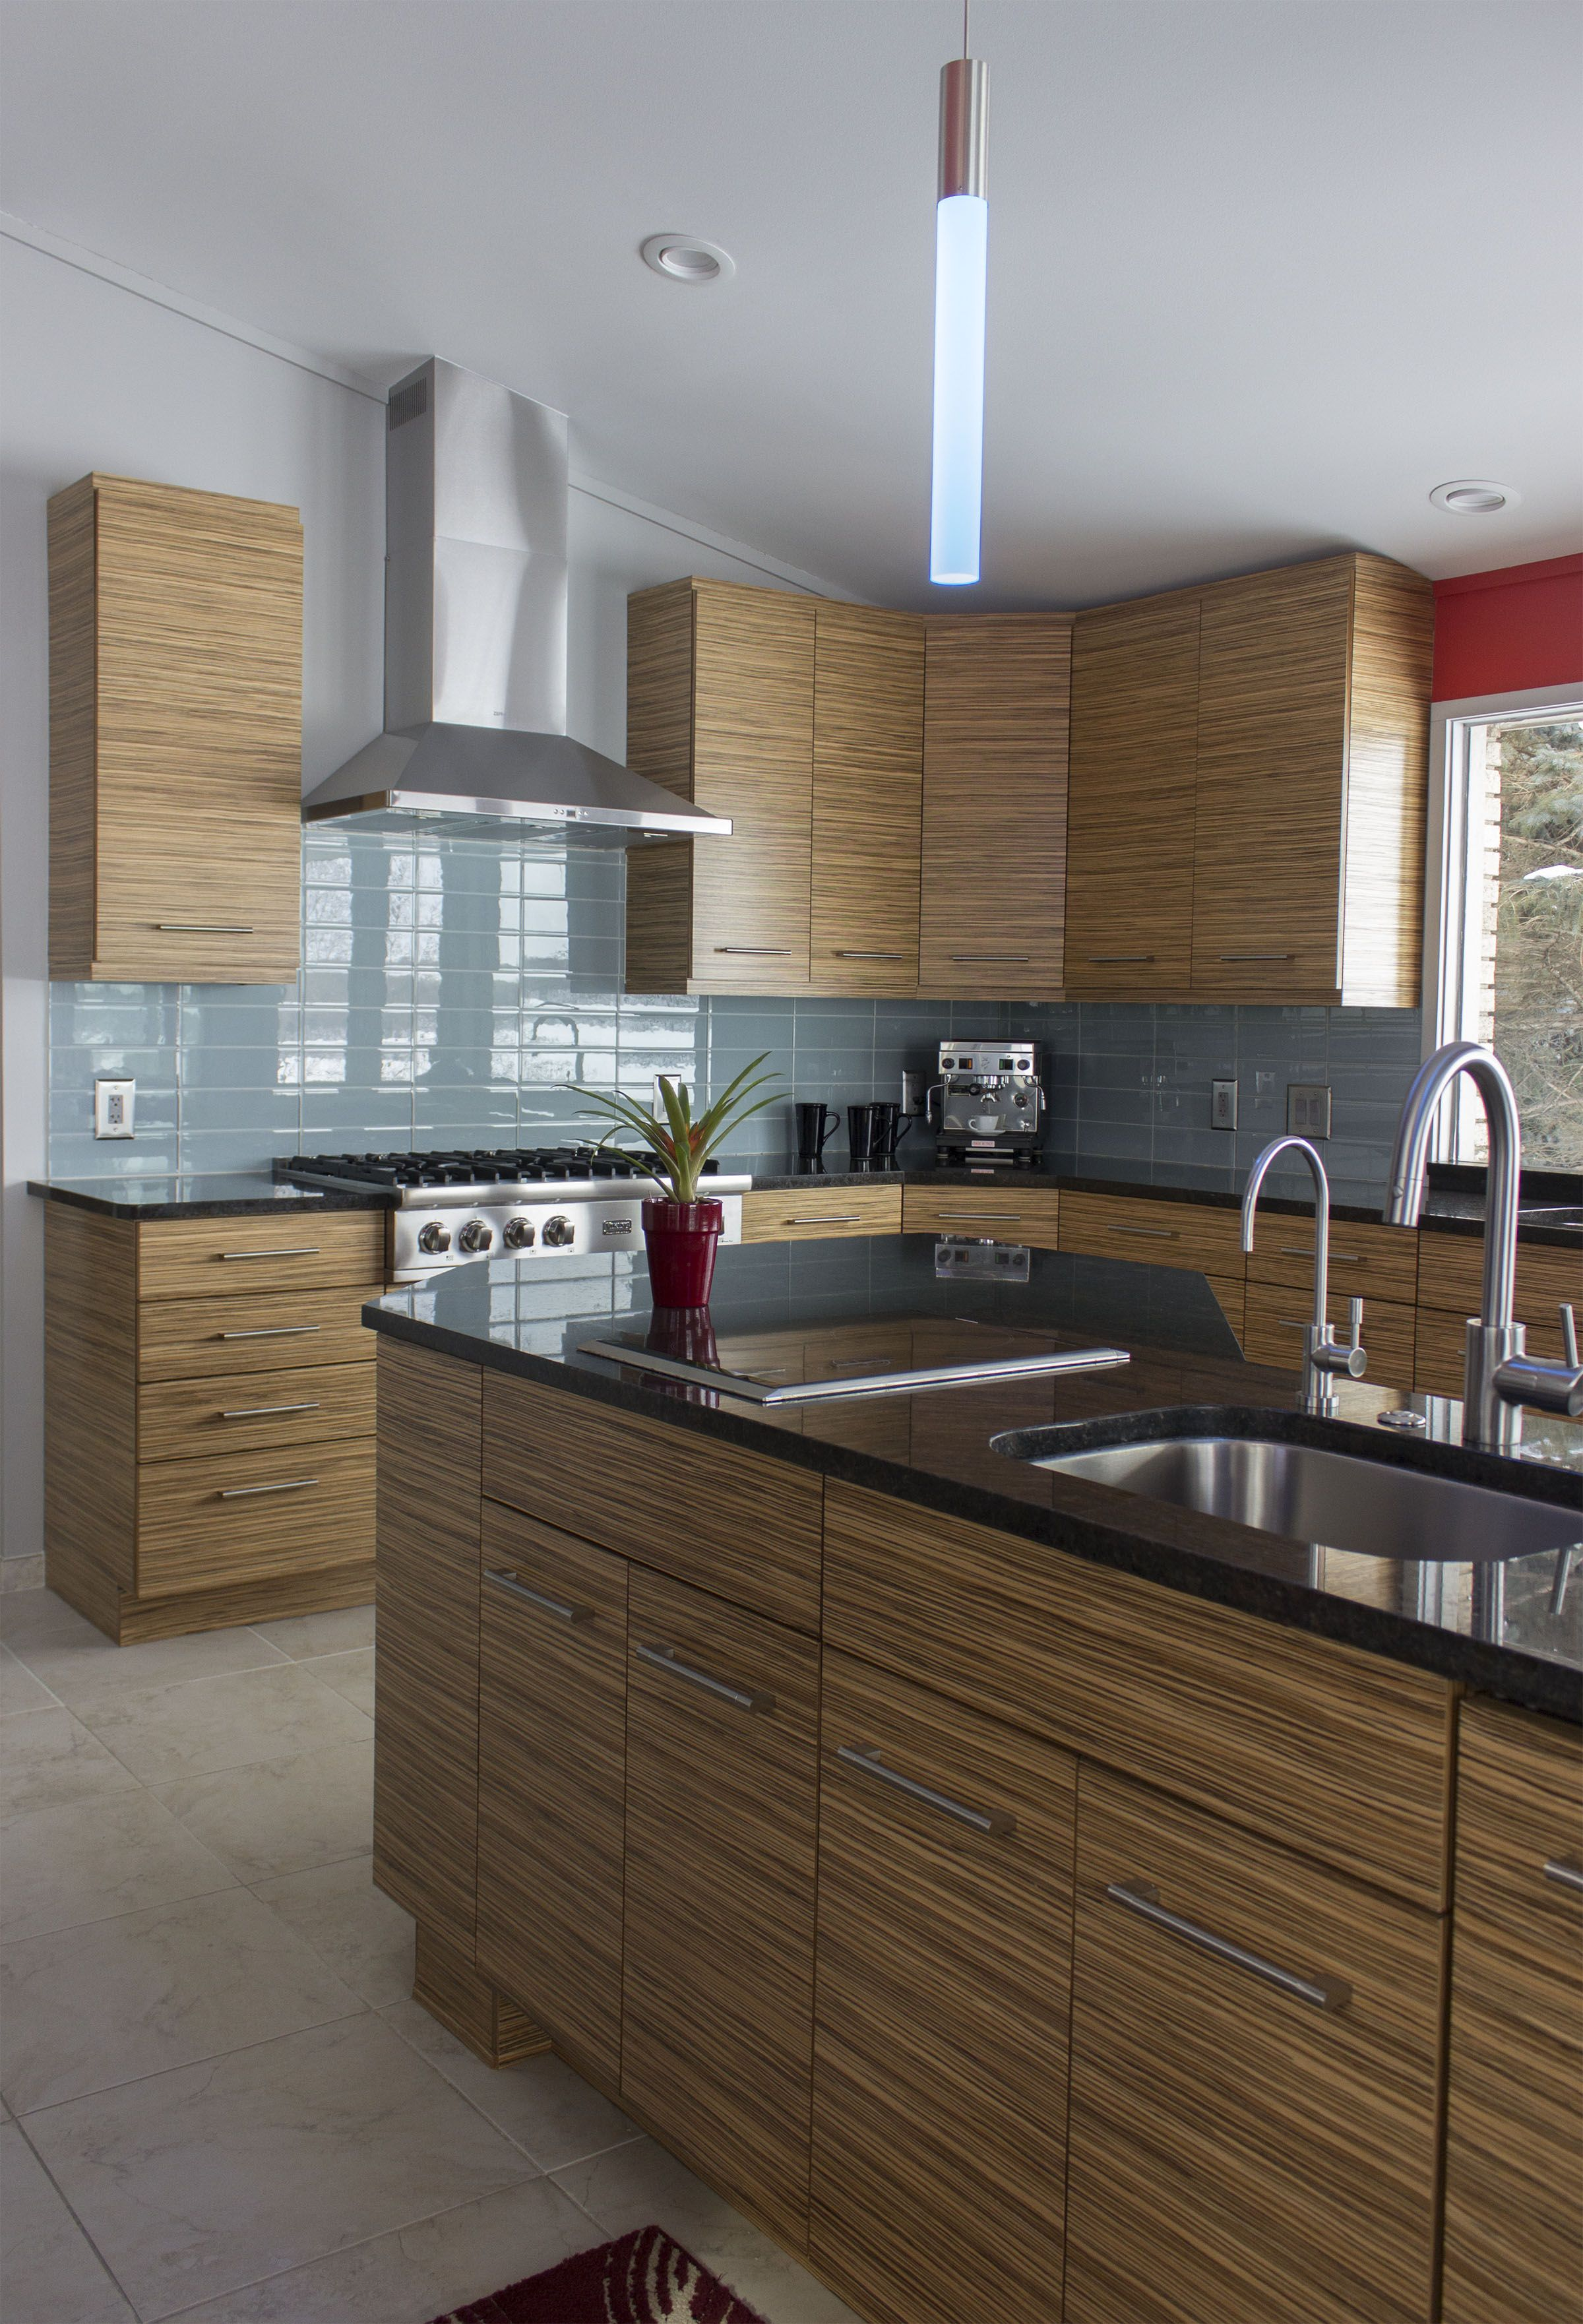 Photo Courtesy Of April Parker Ksi Designer Dura Supreme Alectra Metro Horizontal Zebrawood In Na Modern Wood Kitchen Modern Kitchen Cabinets Kitchen Seating